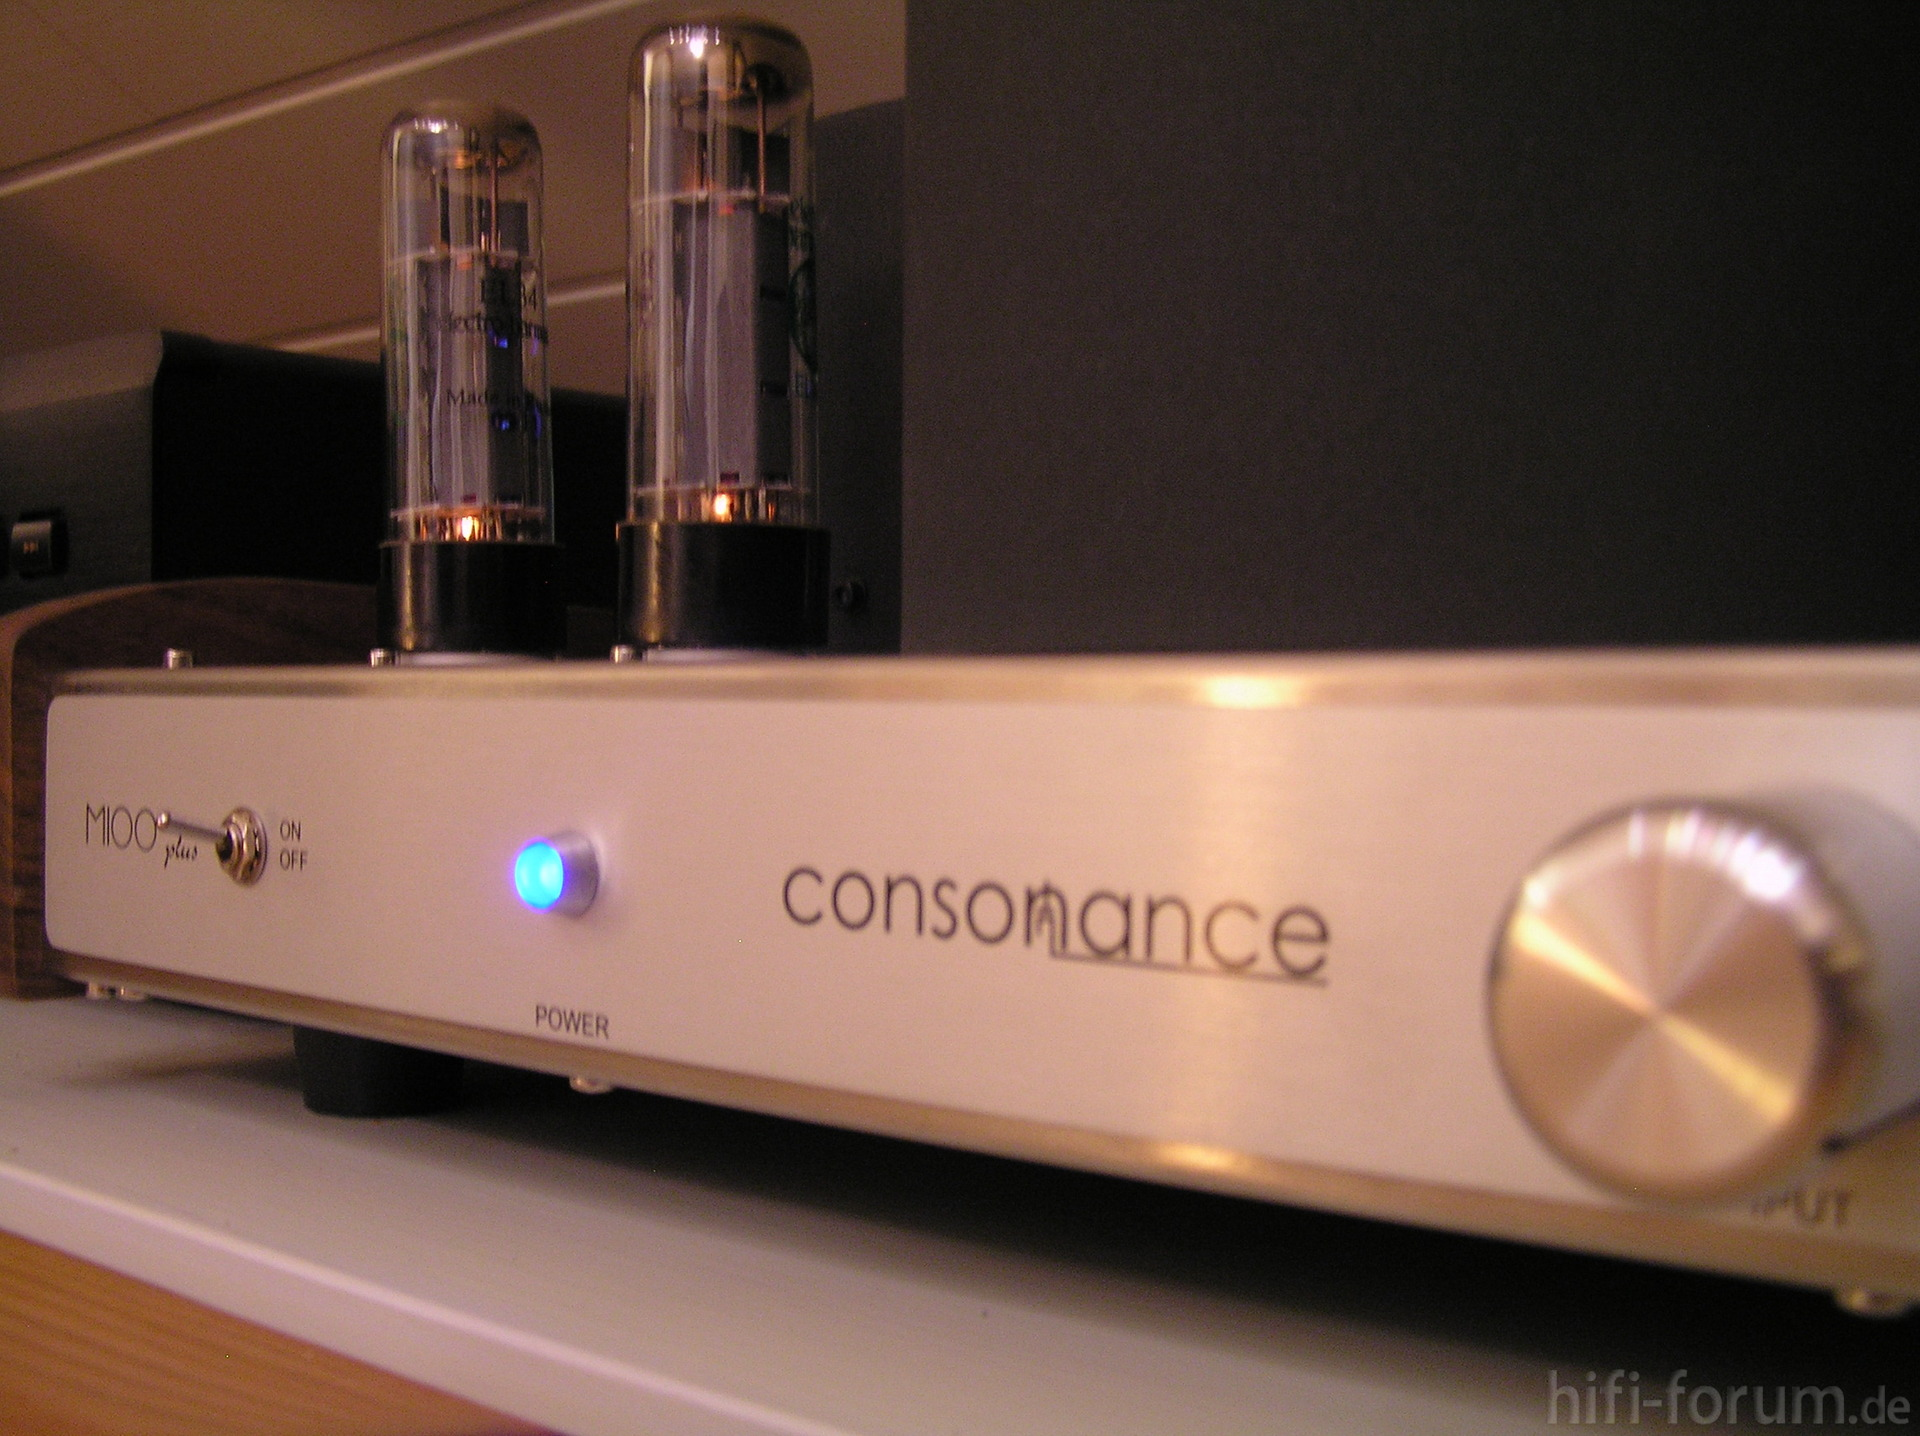 Opera Consonance M 100 Plus